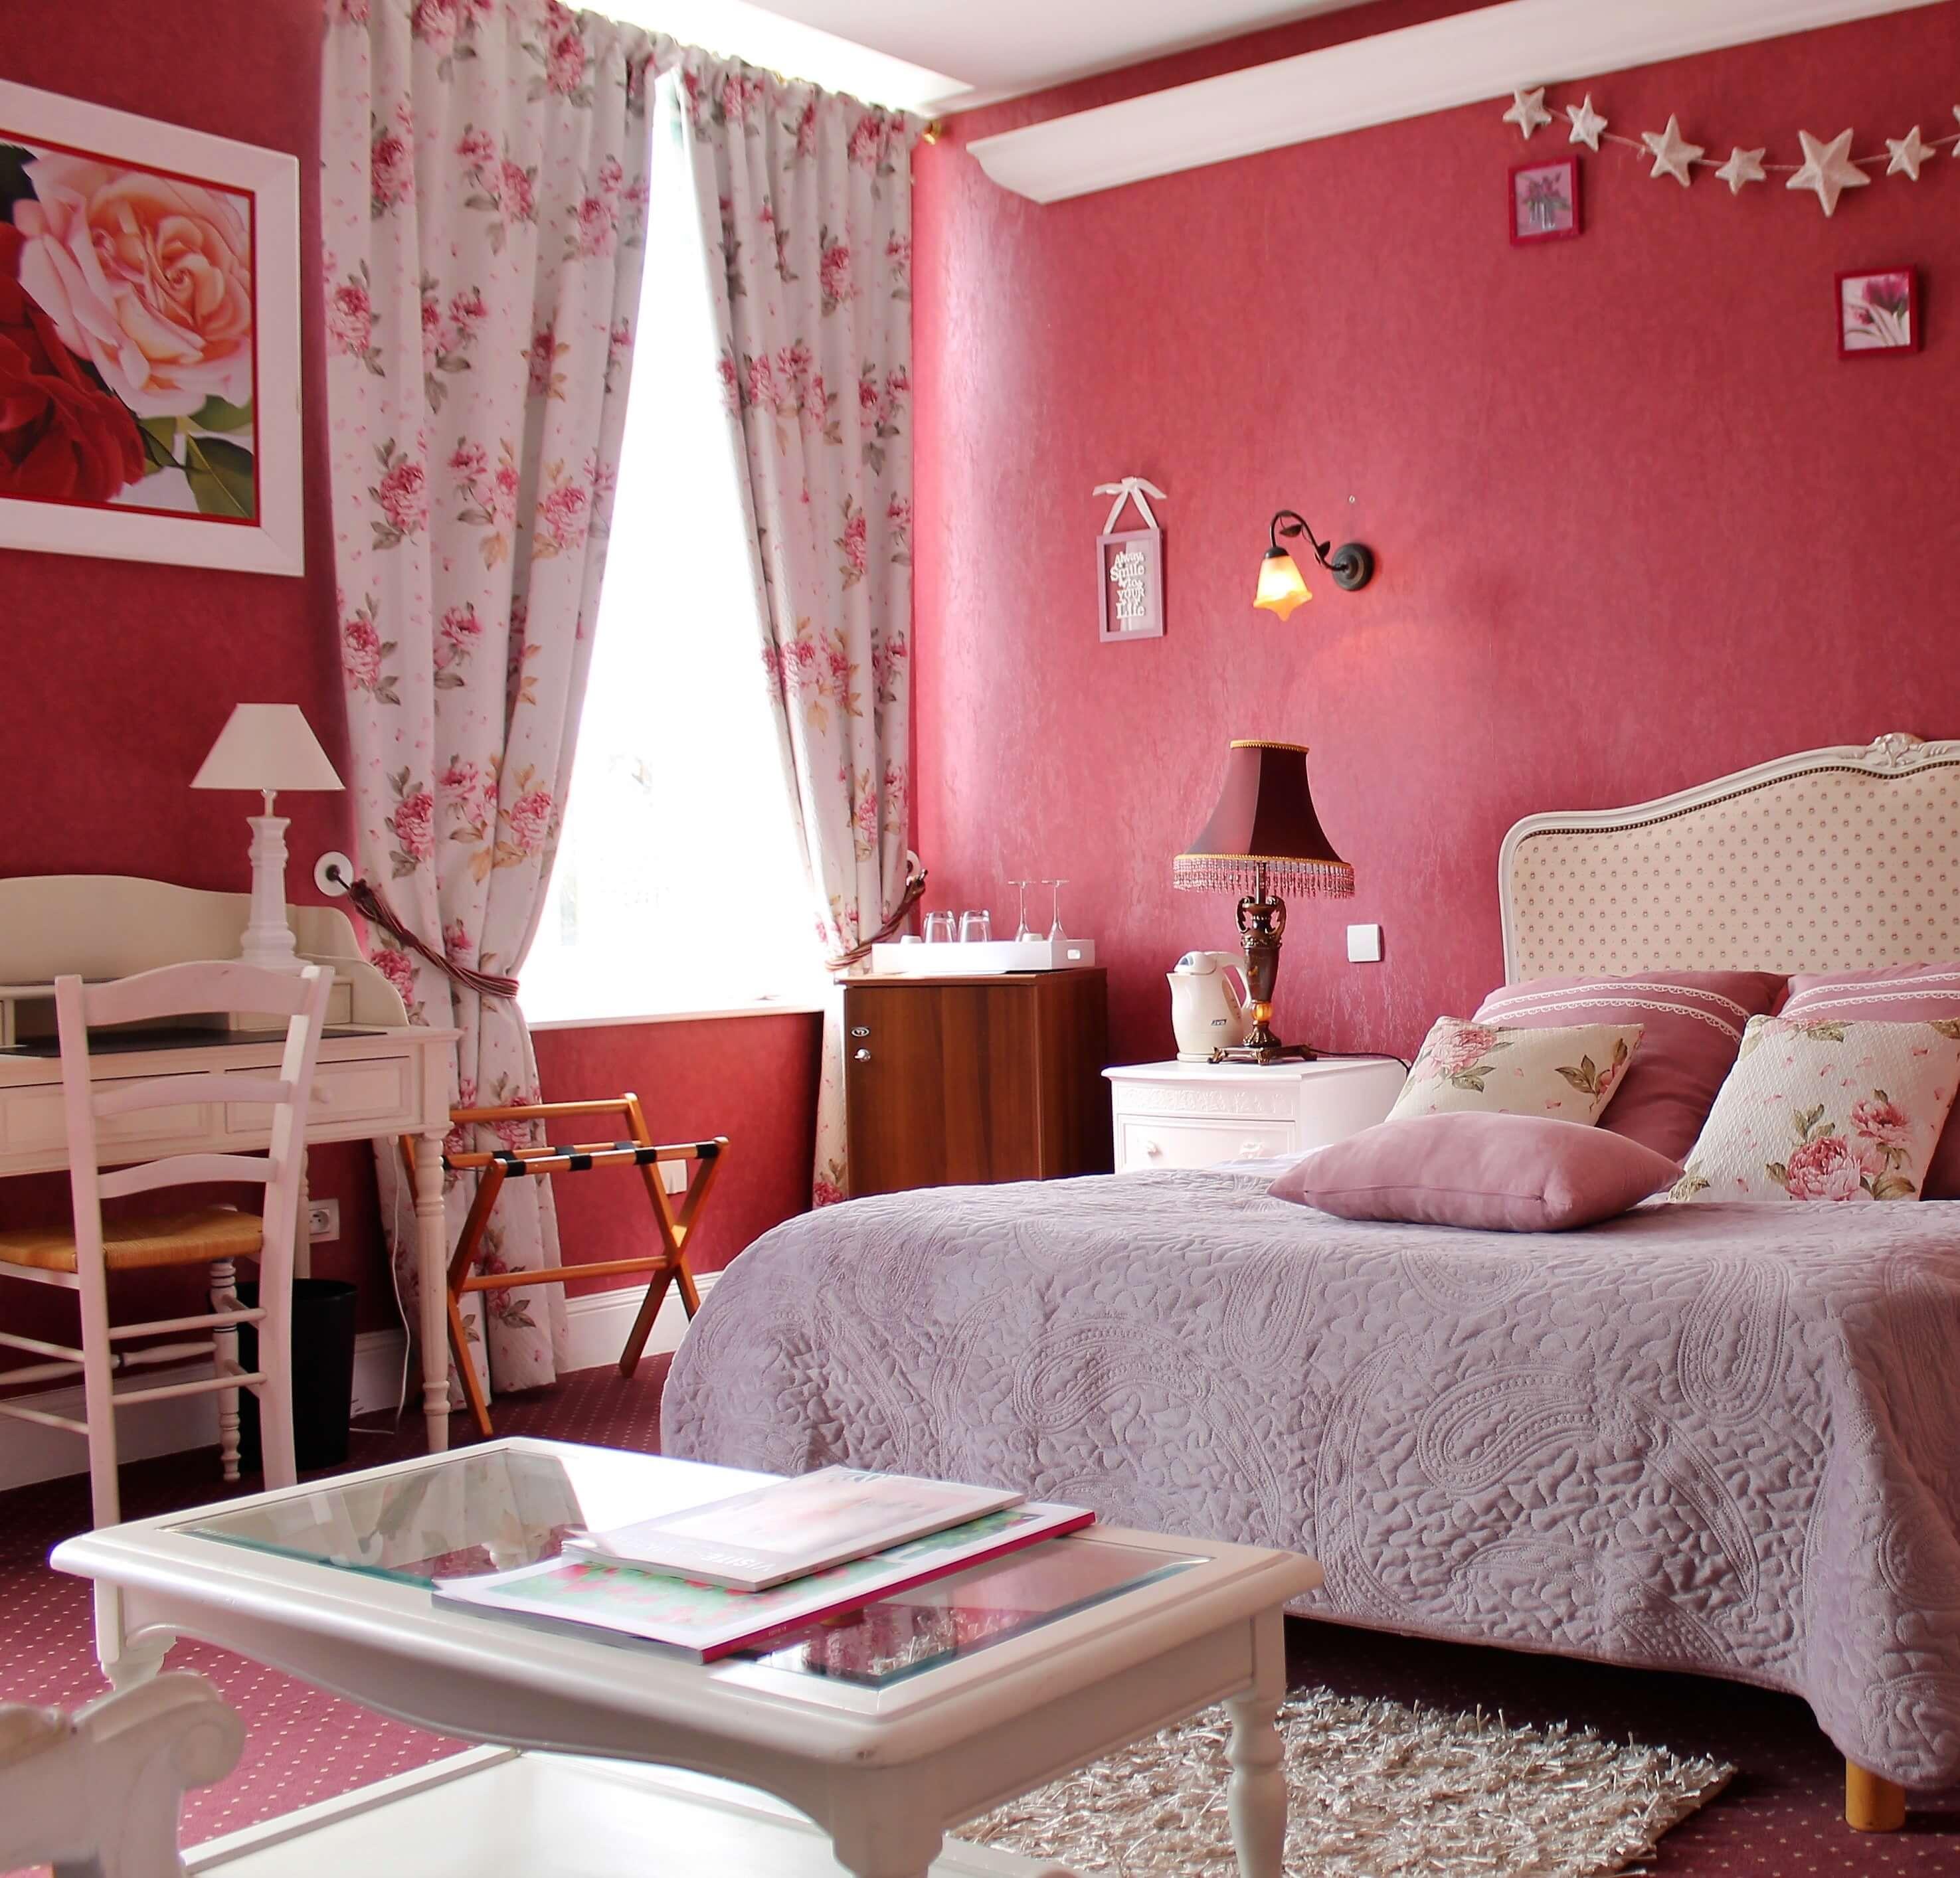 Hotel chambre elegance la vie en rose